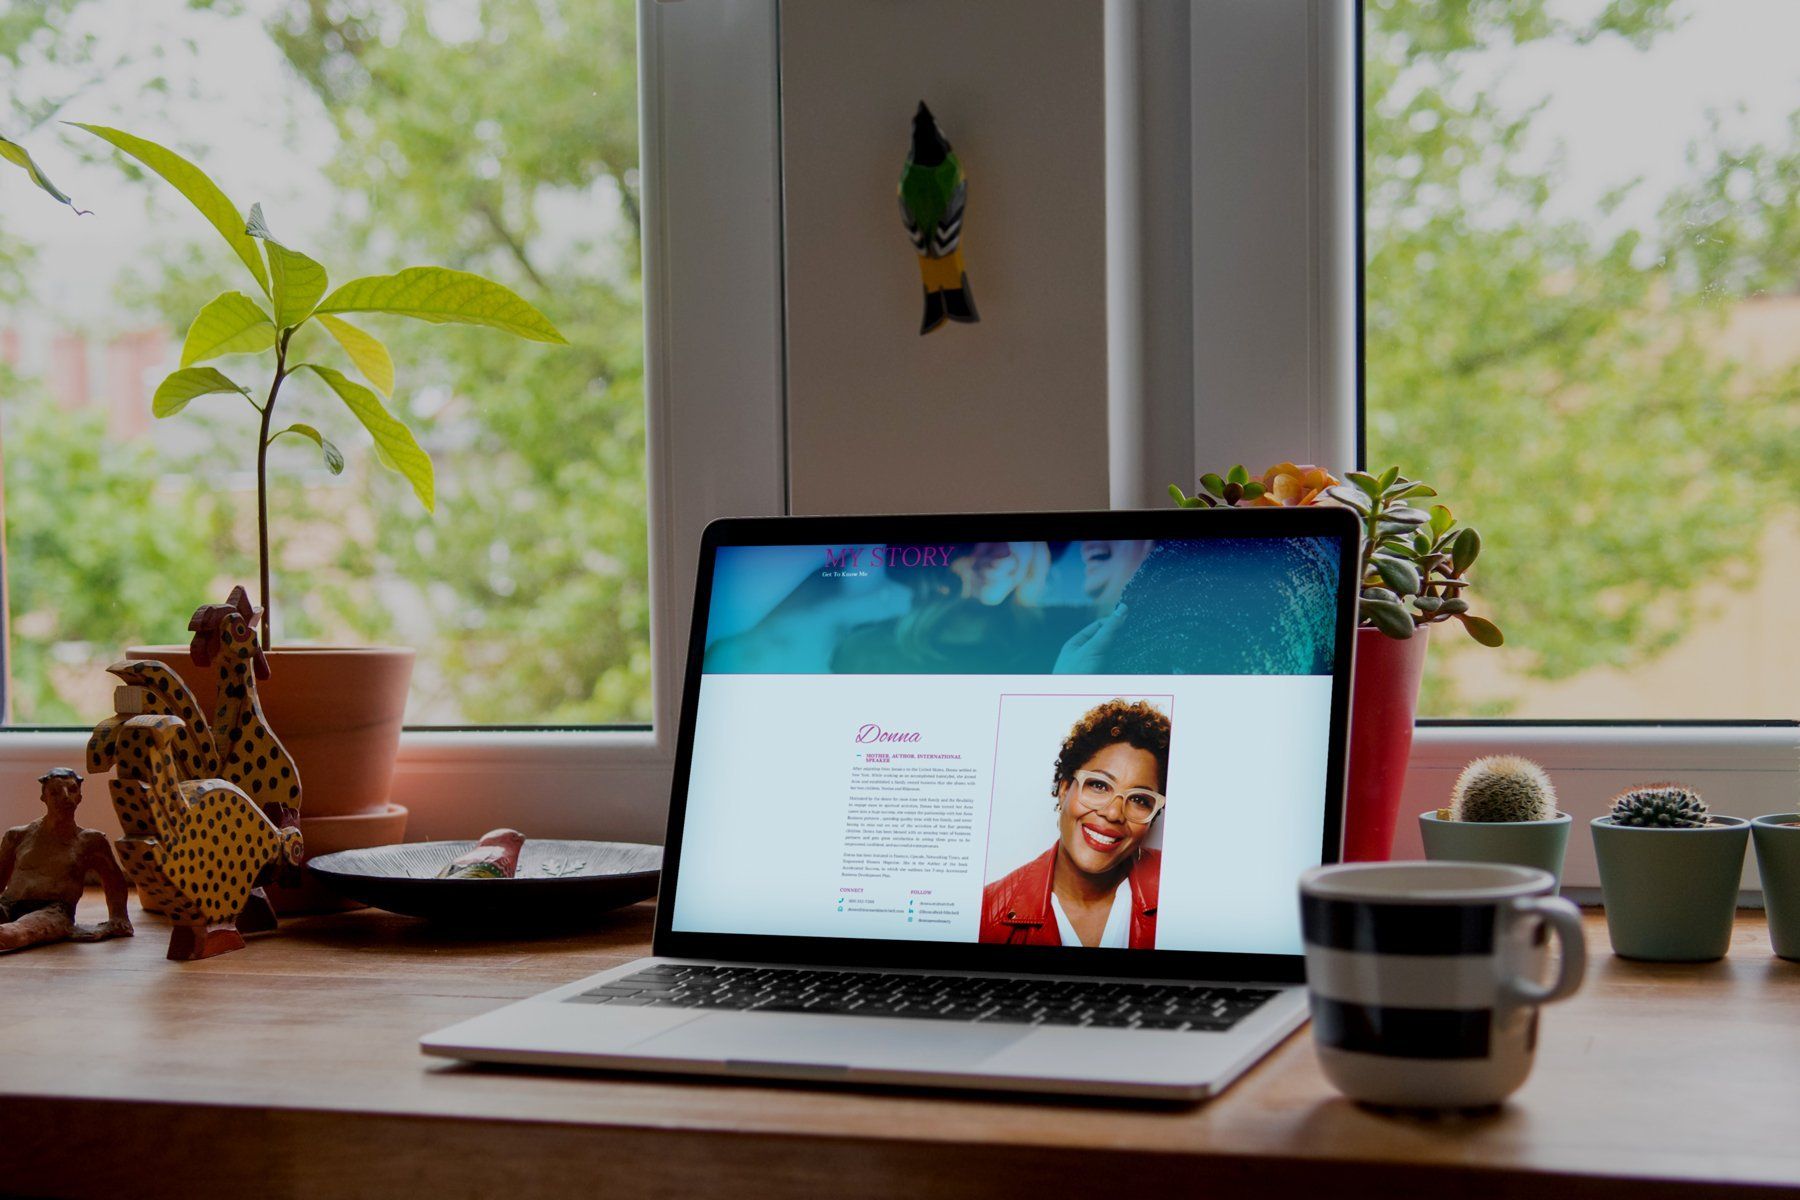 donna reid mitchell, connect media agency design, case study